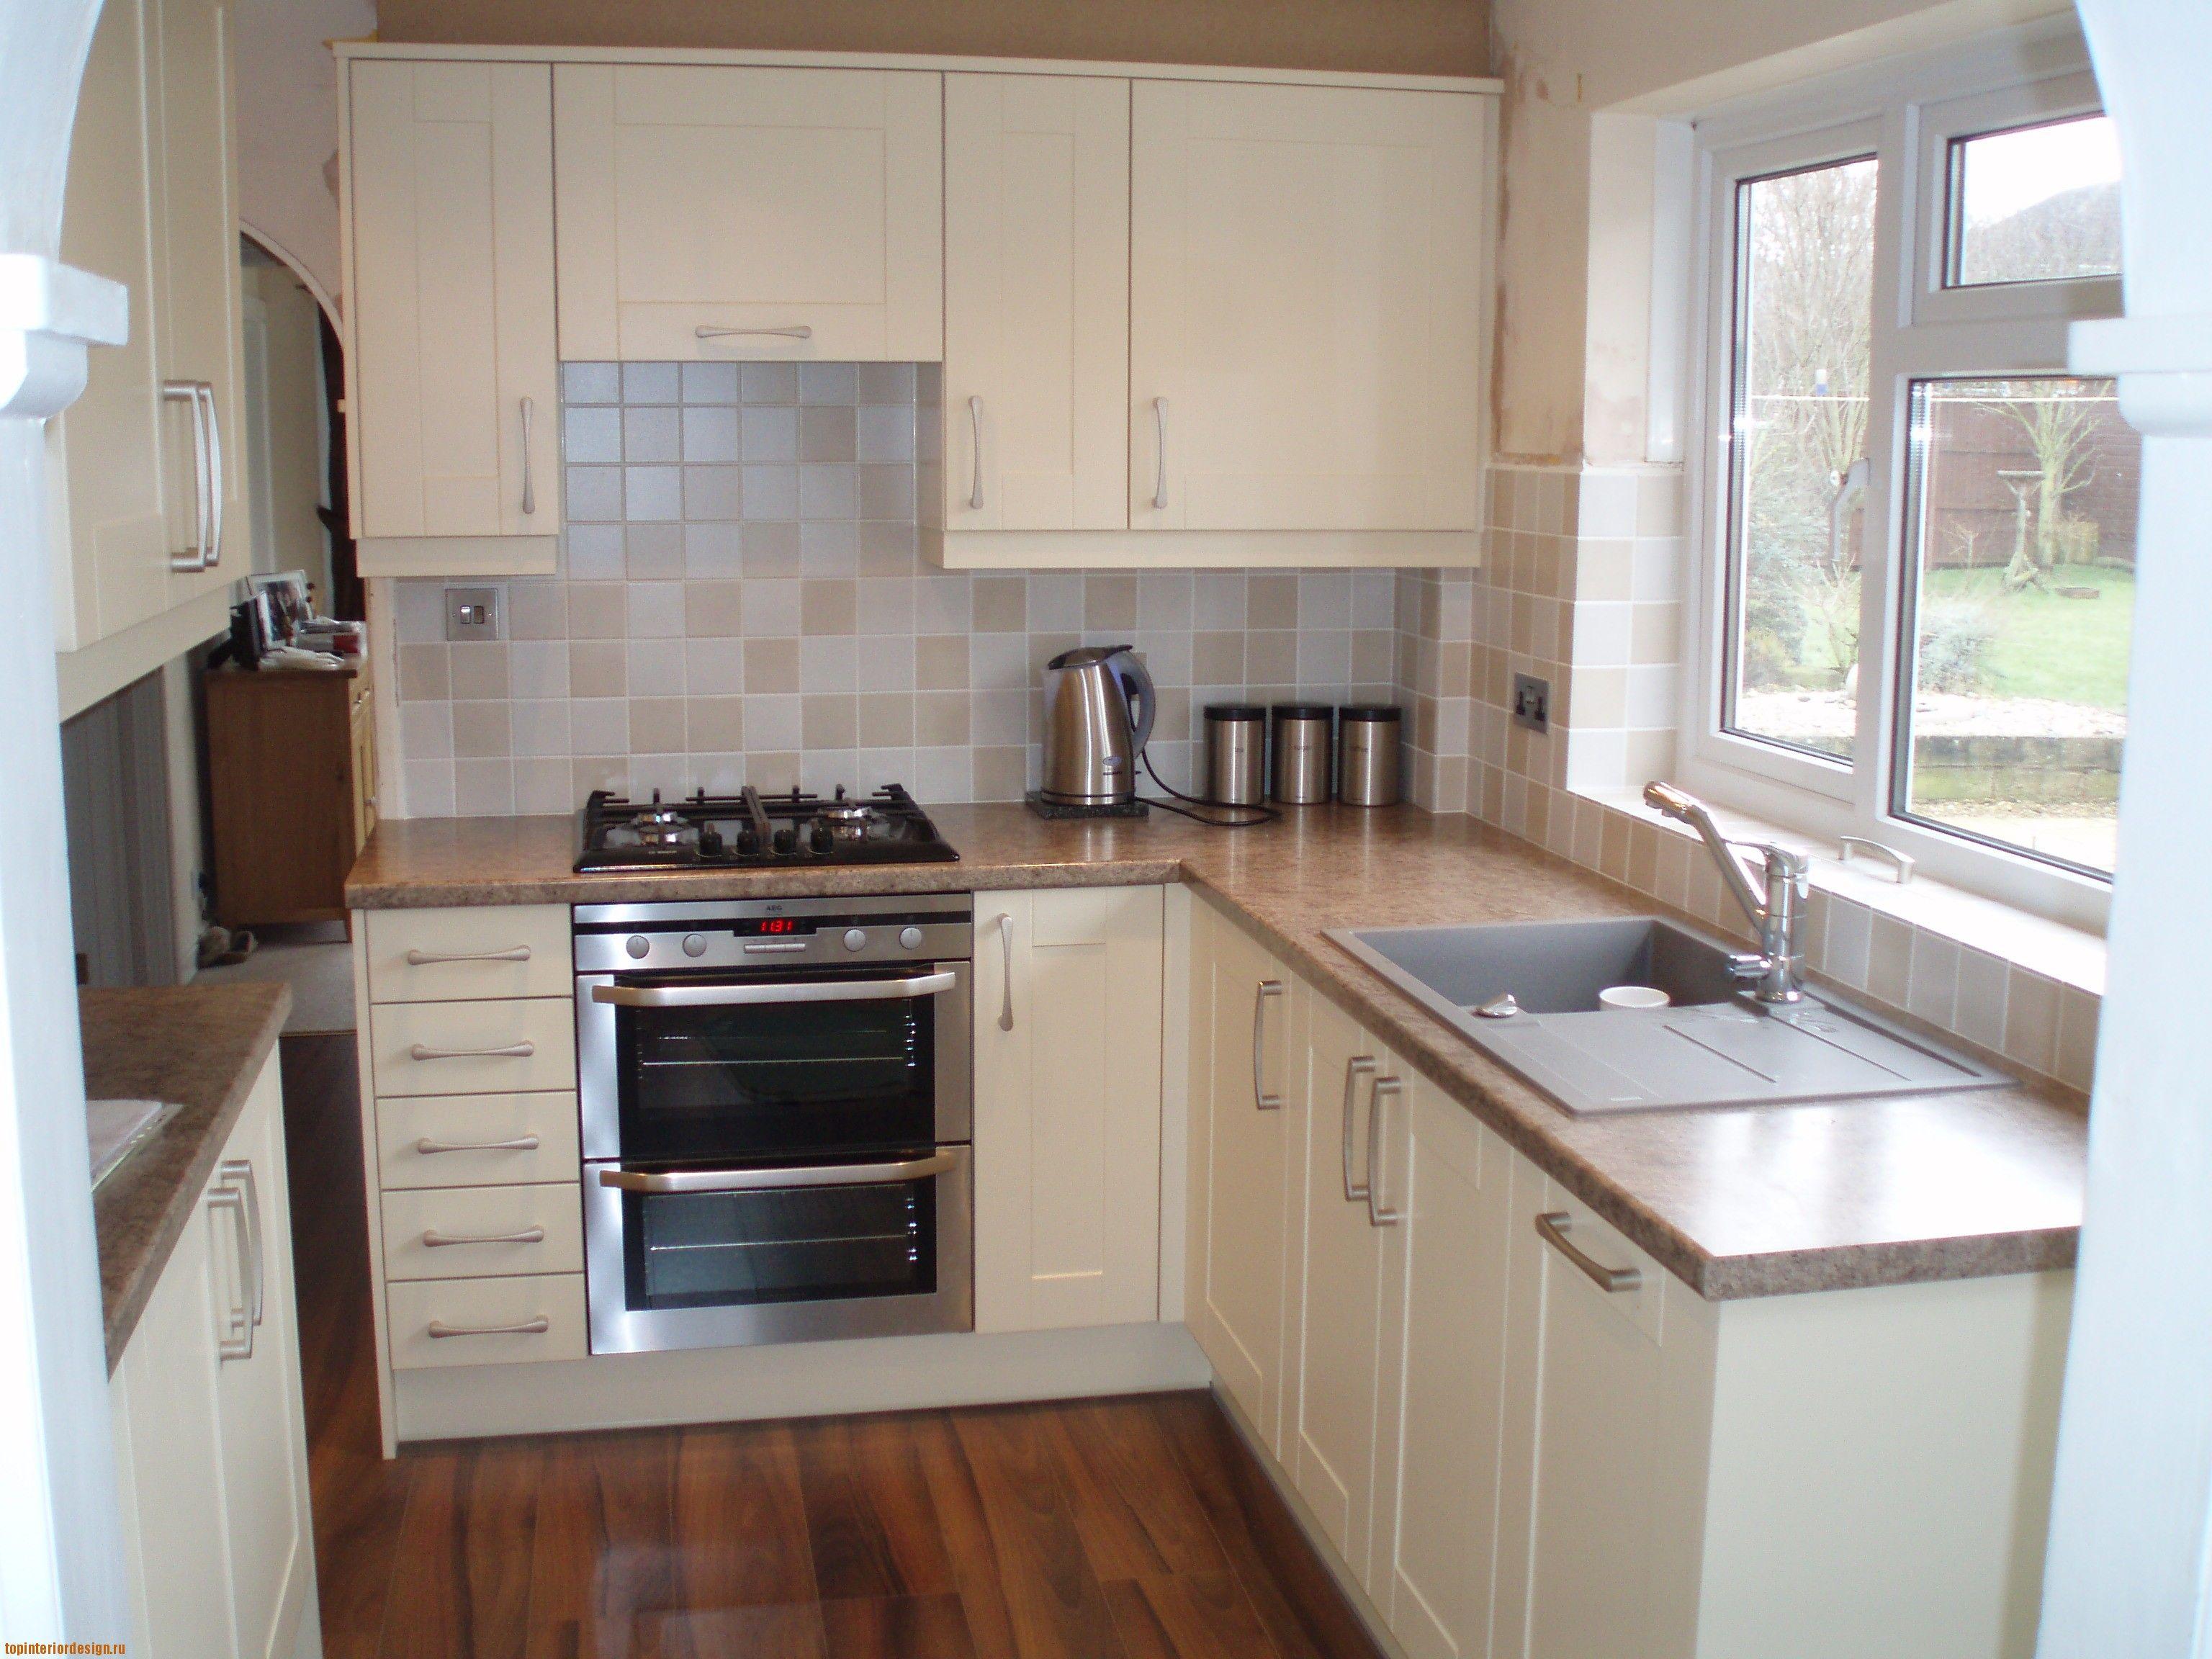 Small kitchen design ideas - Arranging a small kitchen ...